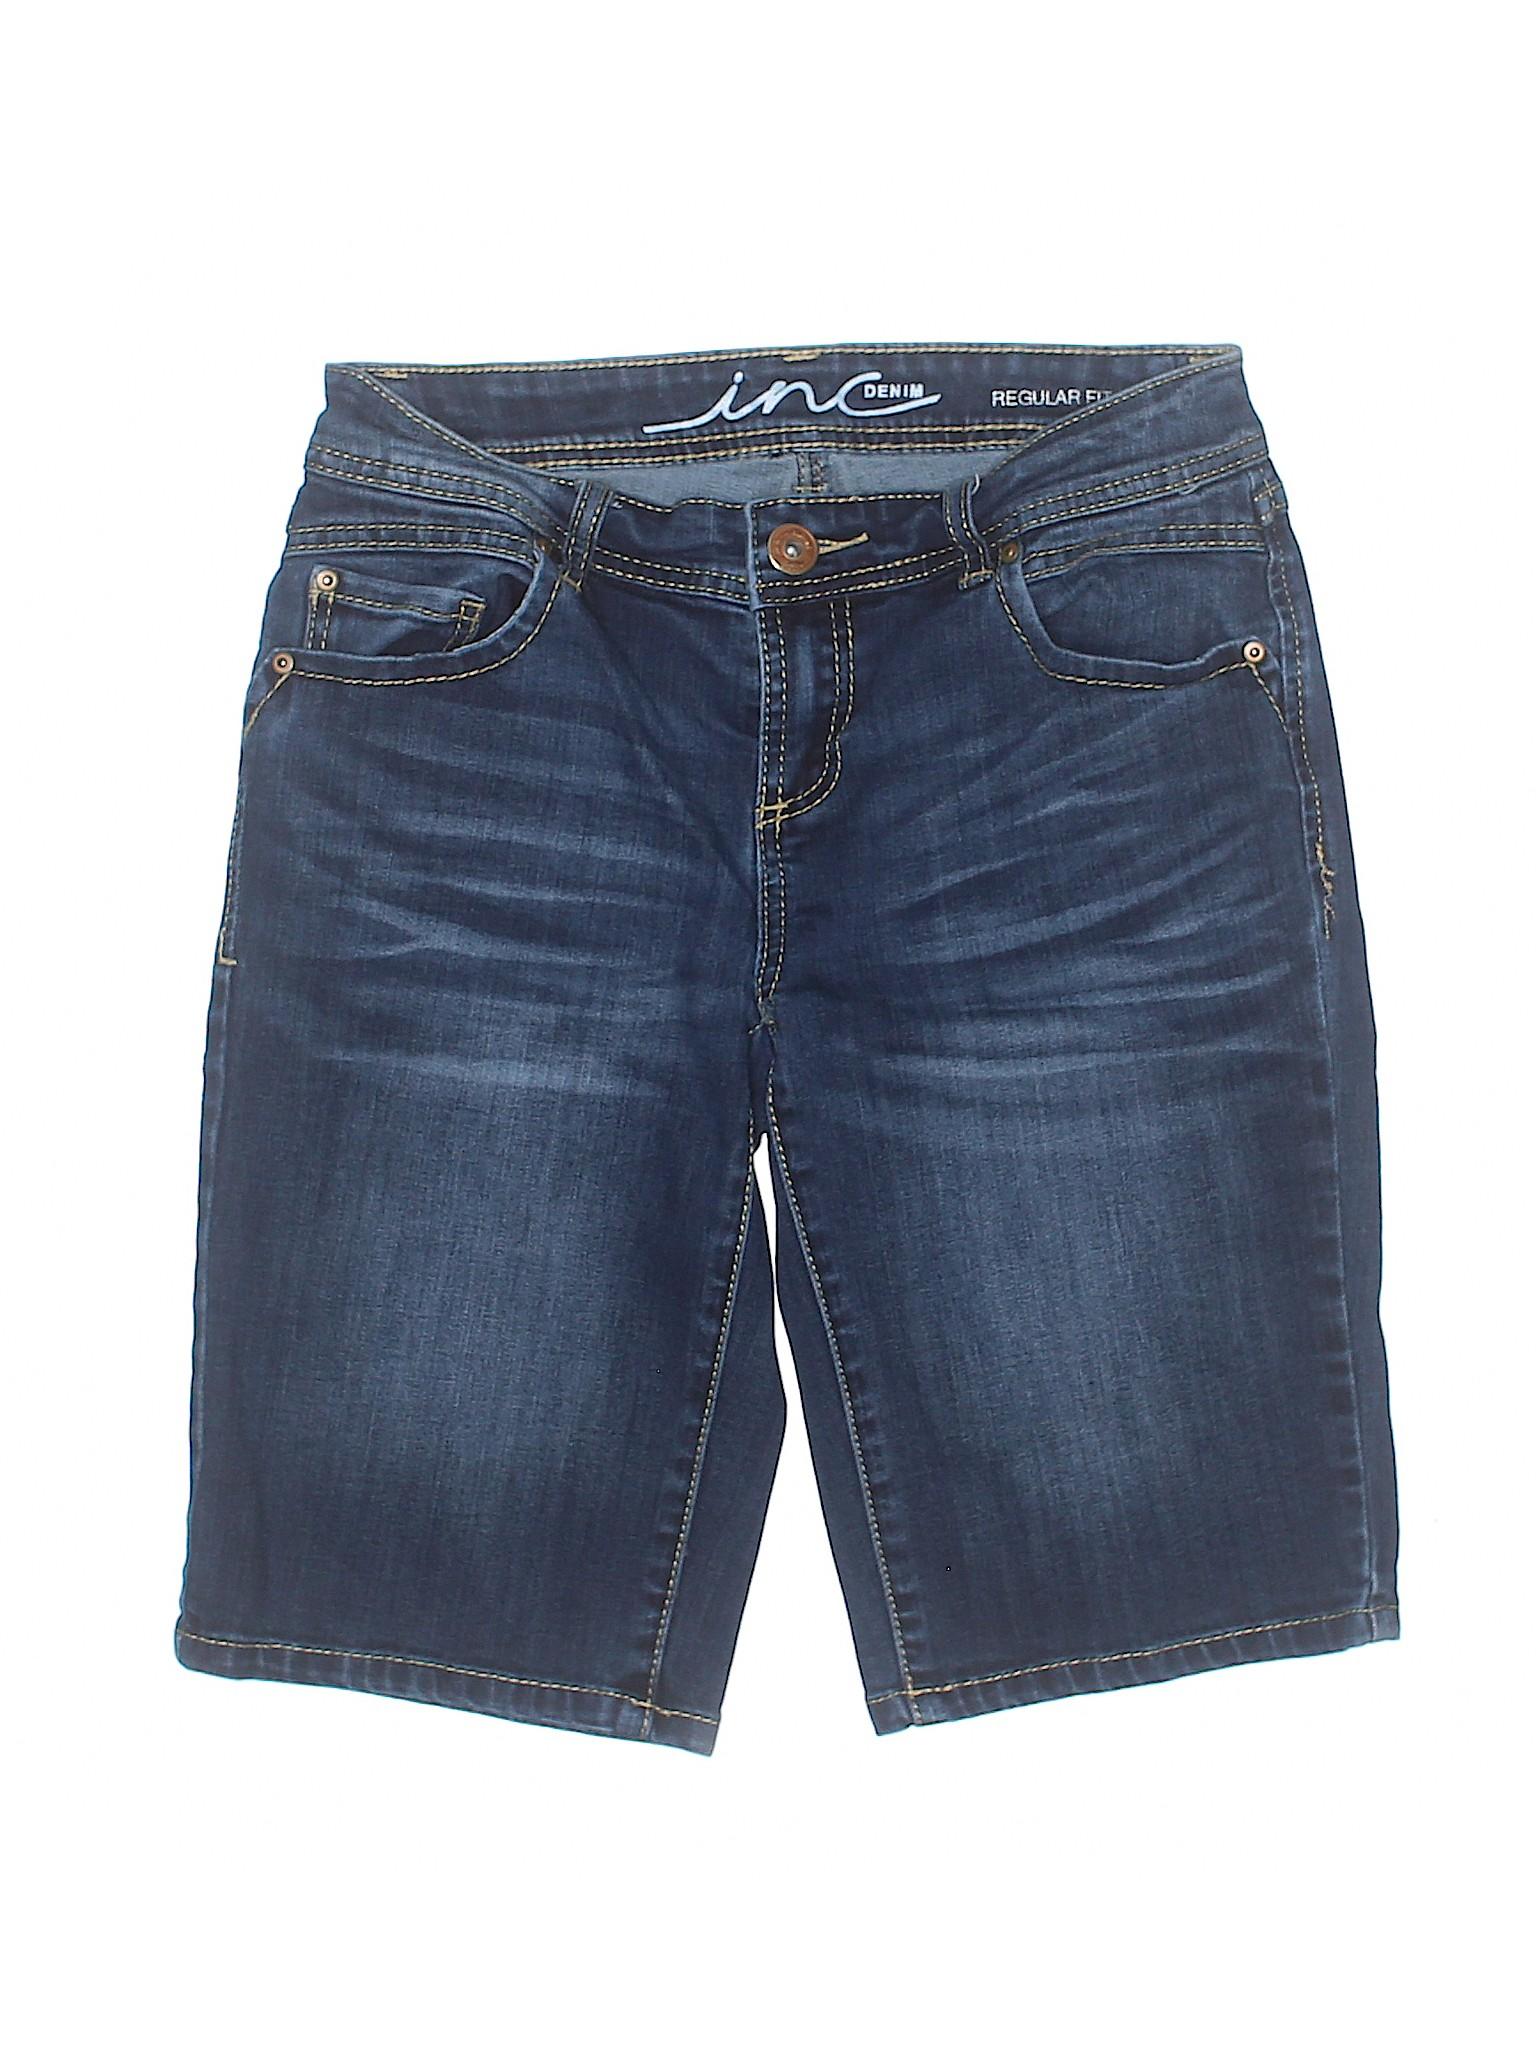 Shorts Leisure Inc Denim Denim winter qwvnOw1f